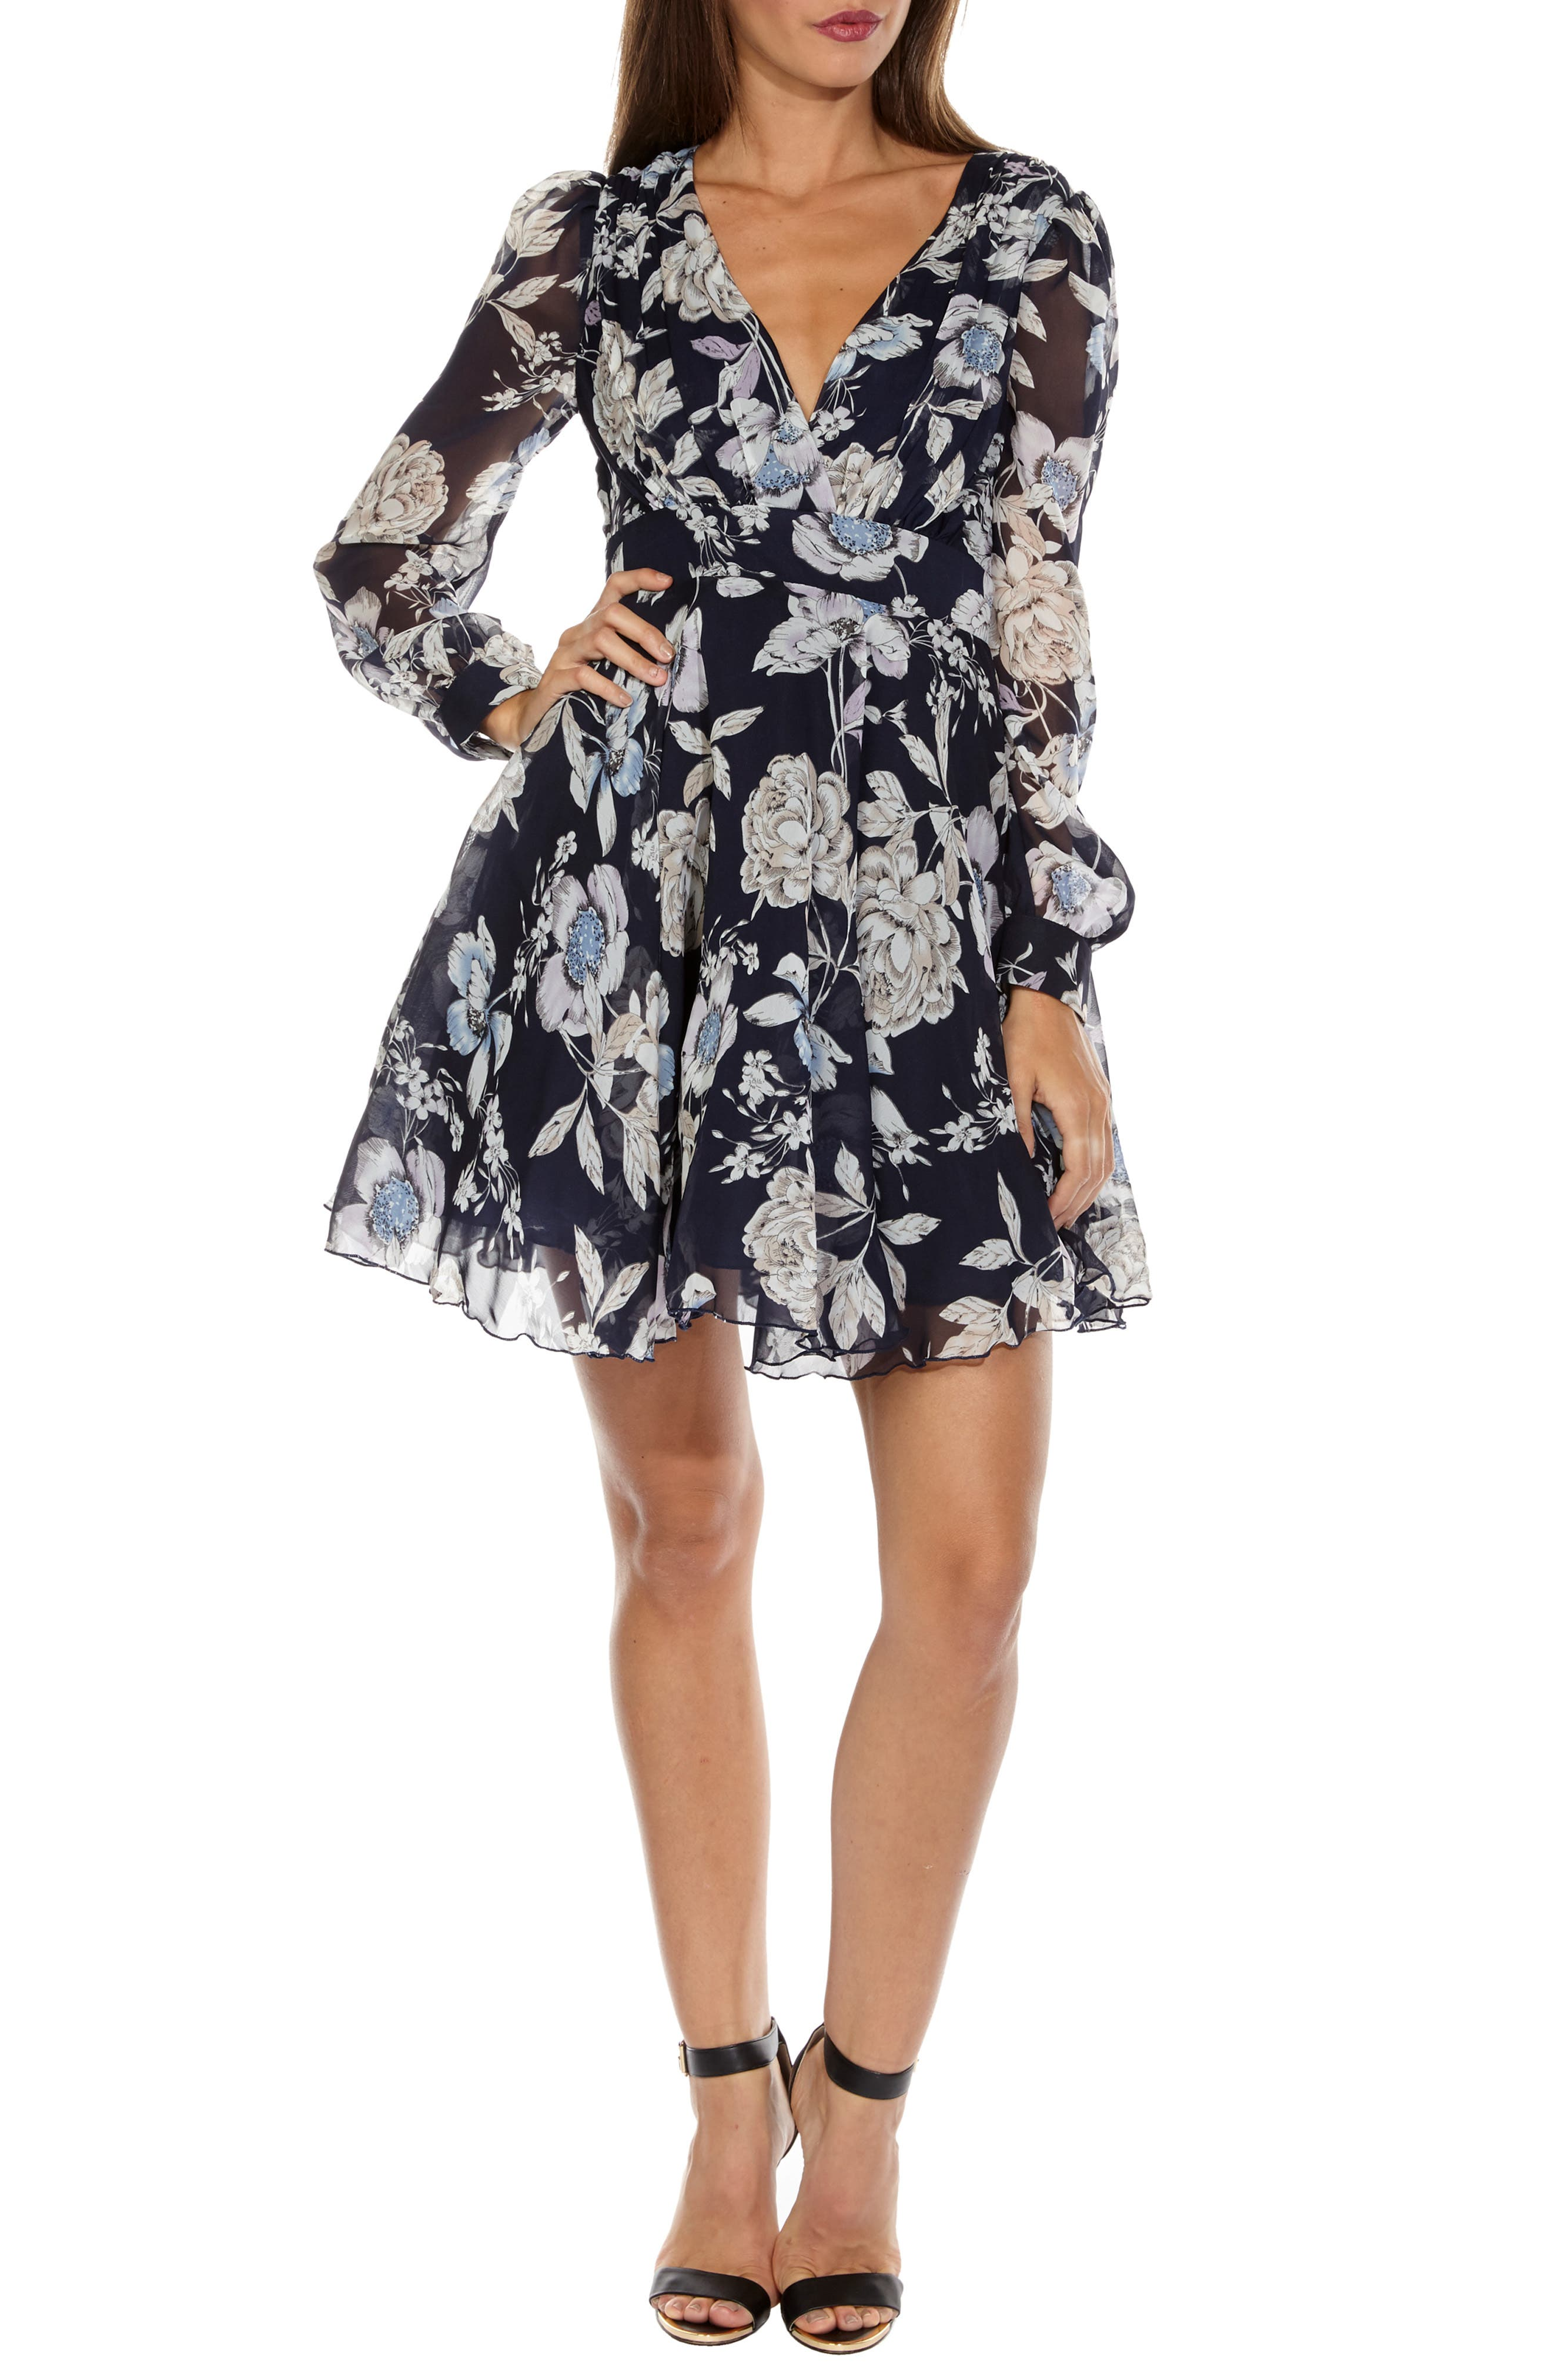 Nordi Floral Fit & Flare Party Dress,                             Main thumbnail 1, color,                             FLORAL PRINT